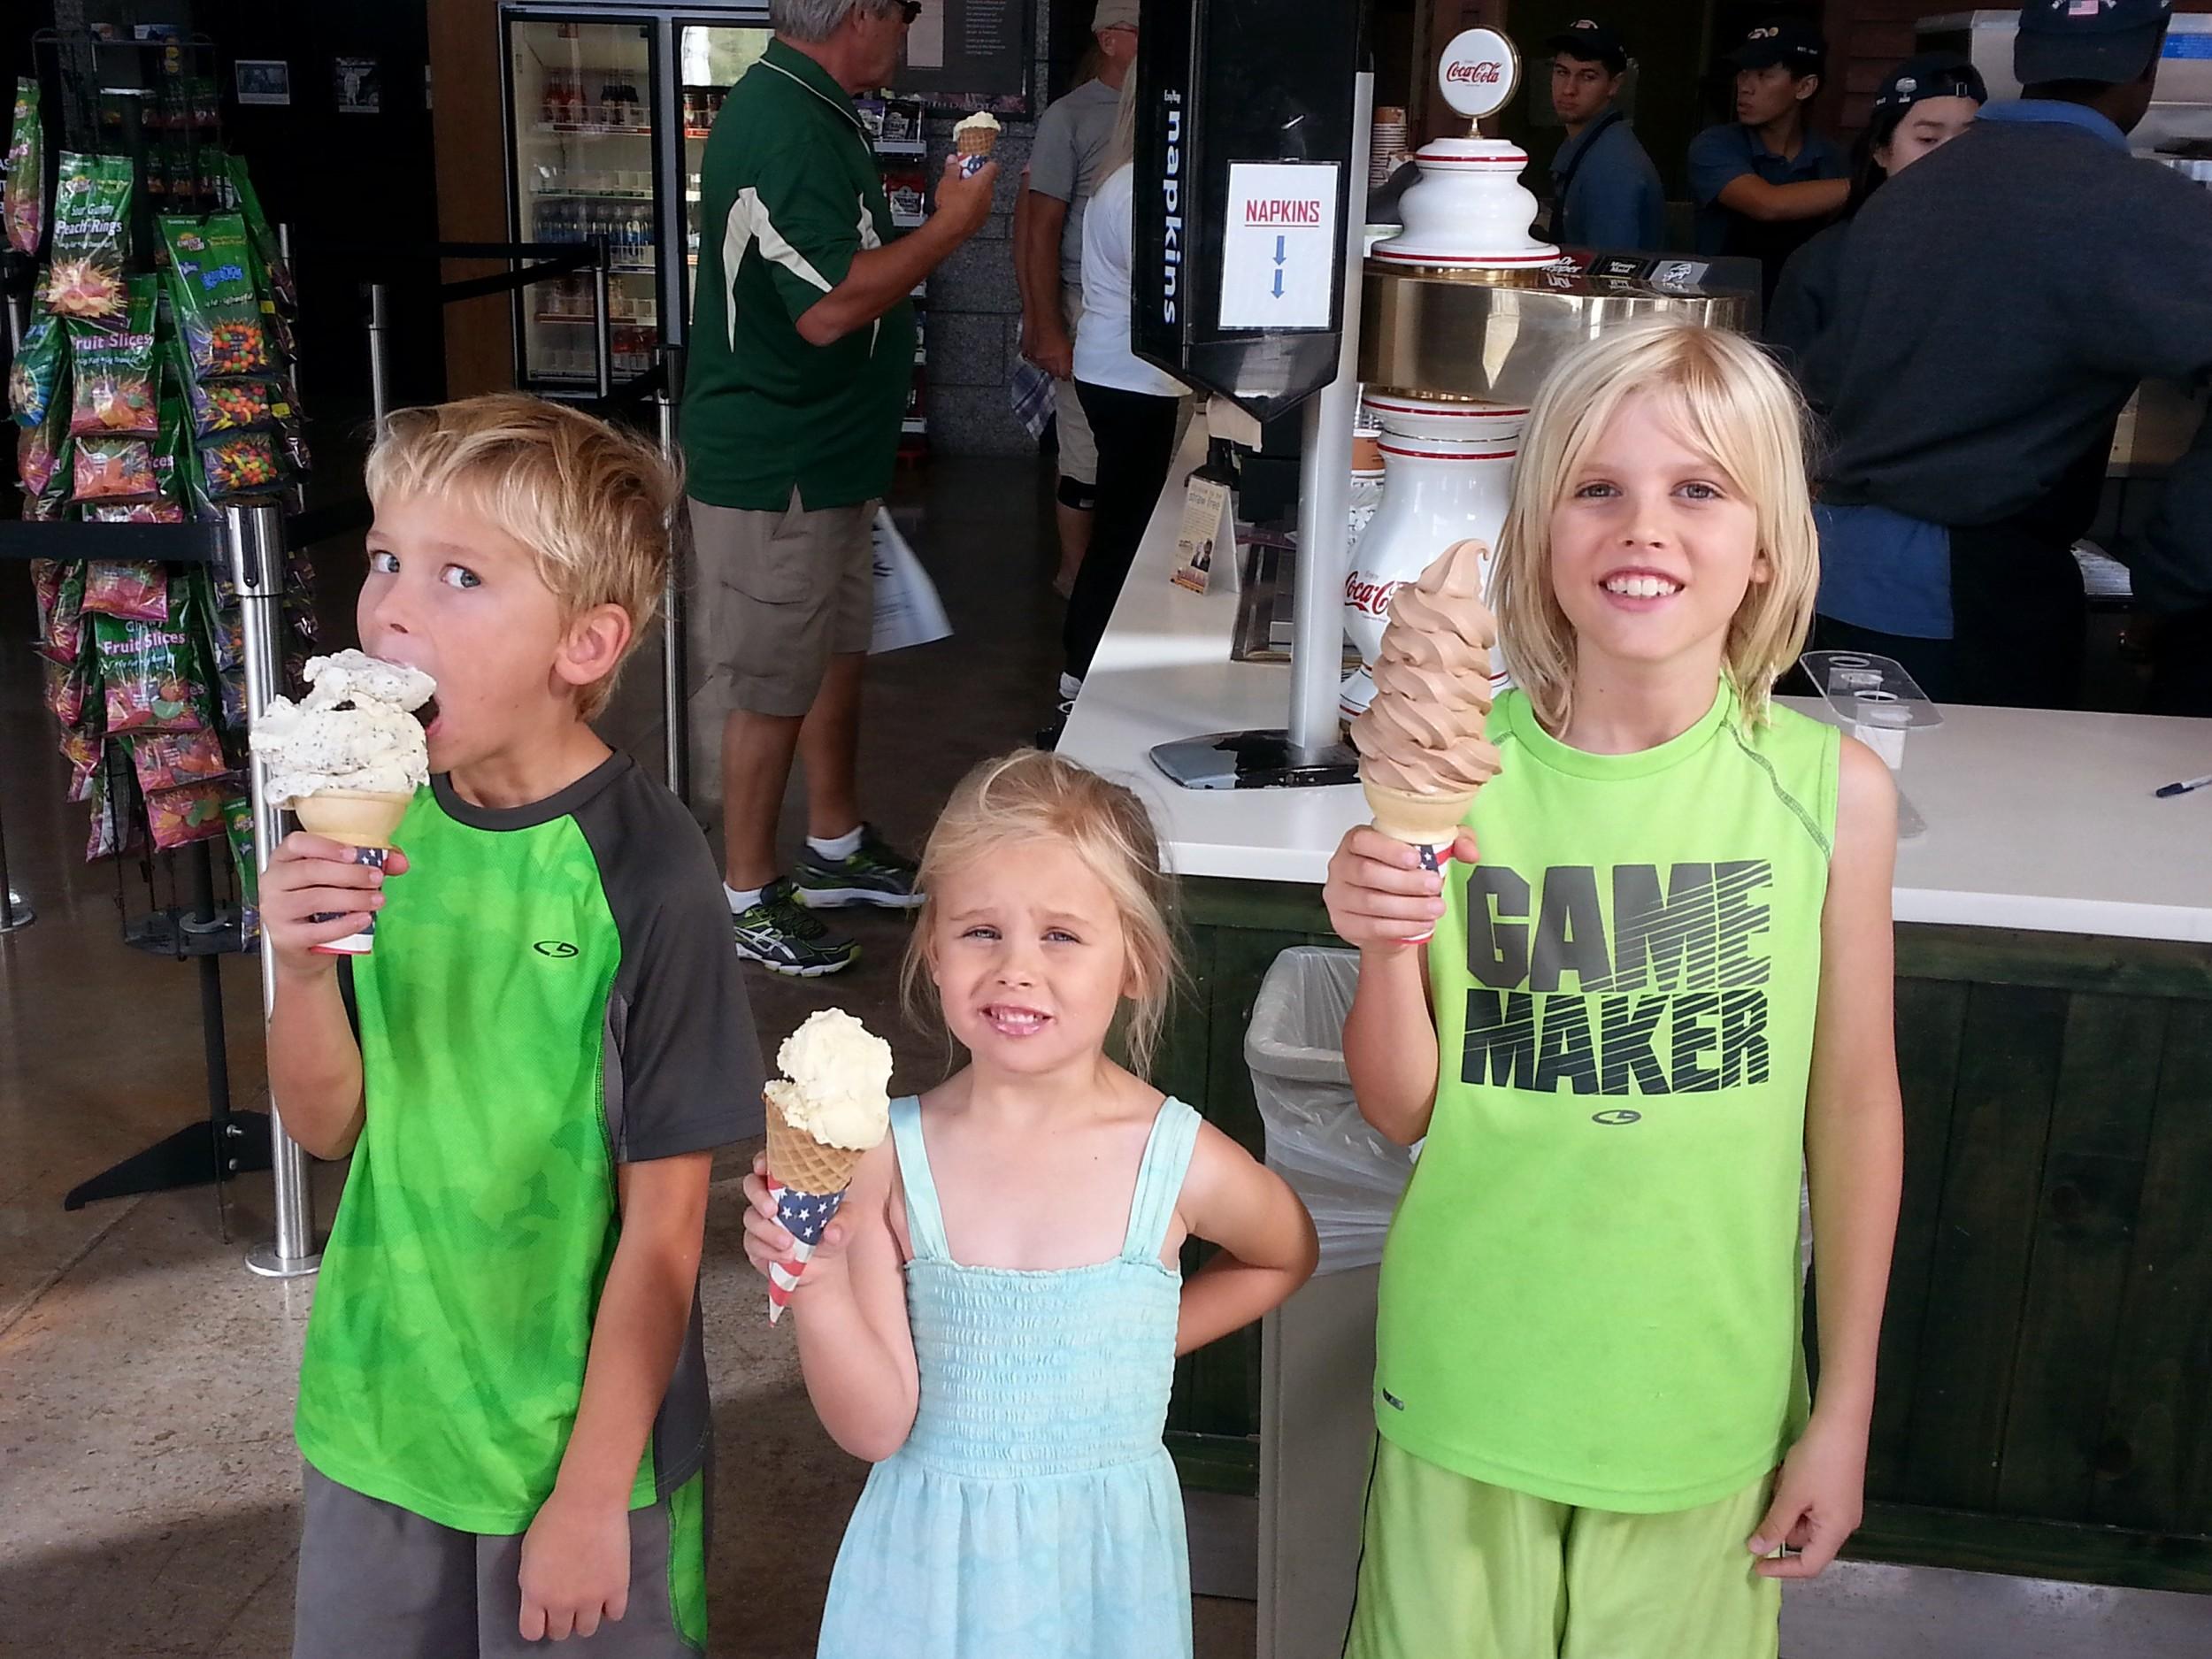 """The Ice Cream place"": aka Mount Rushmore National Memorial."